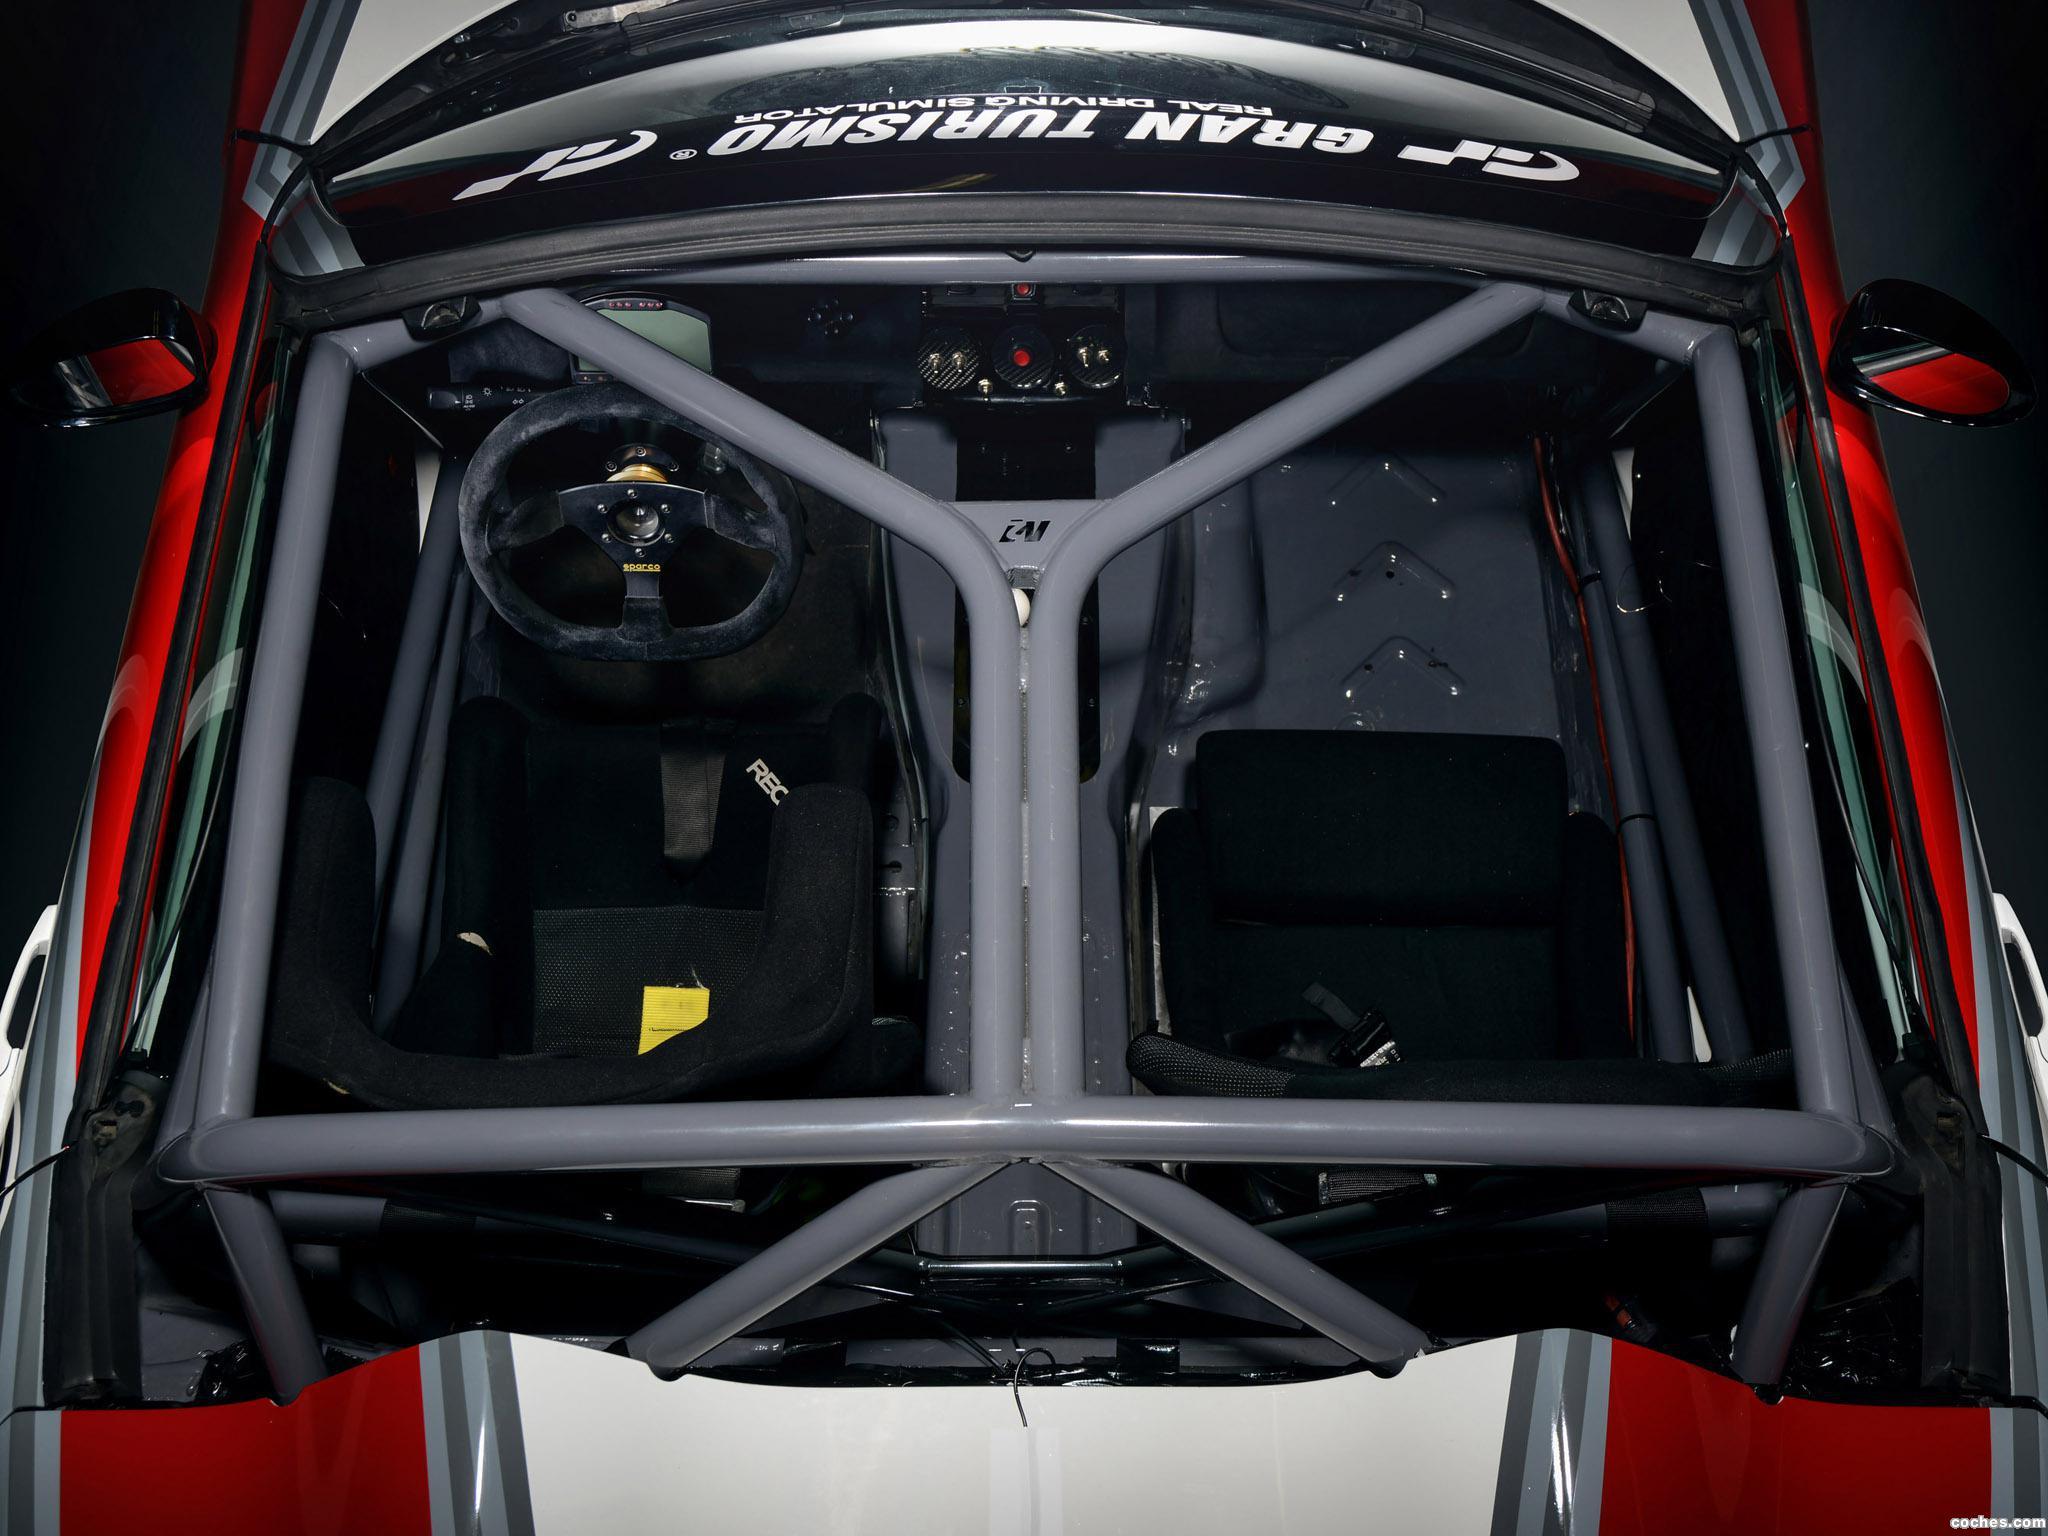 Foto 5 de Cam Shaft Opel GT Maedchen And Motoren 2014